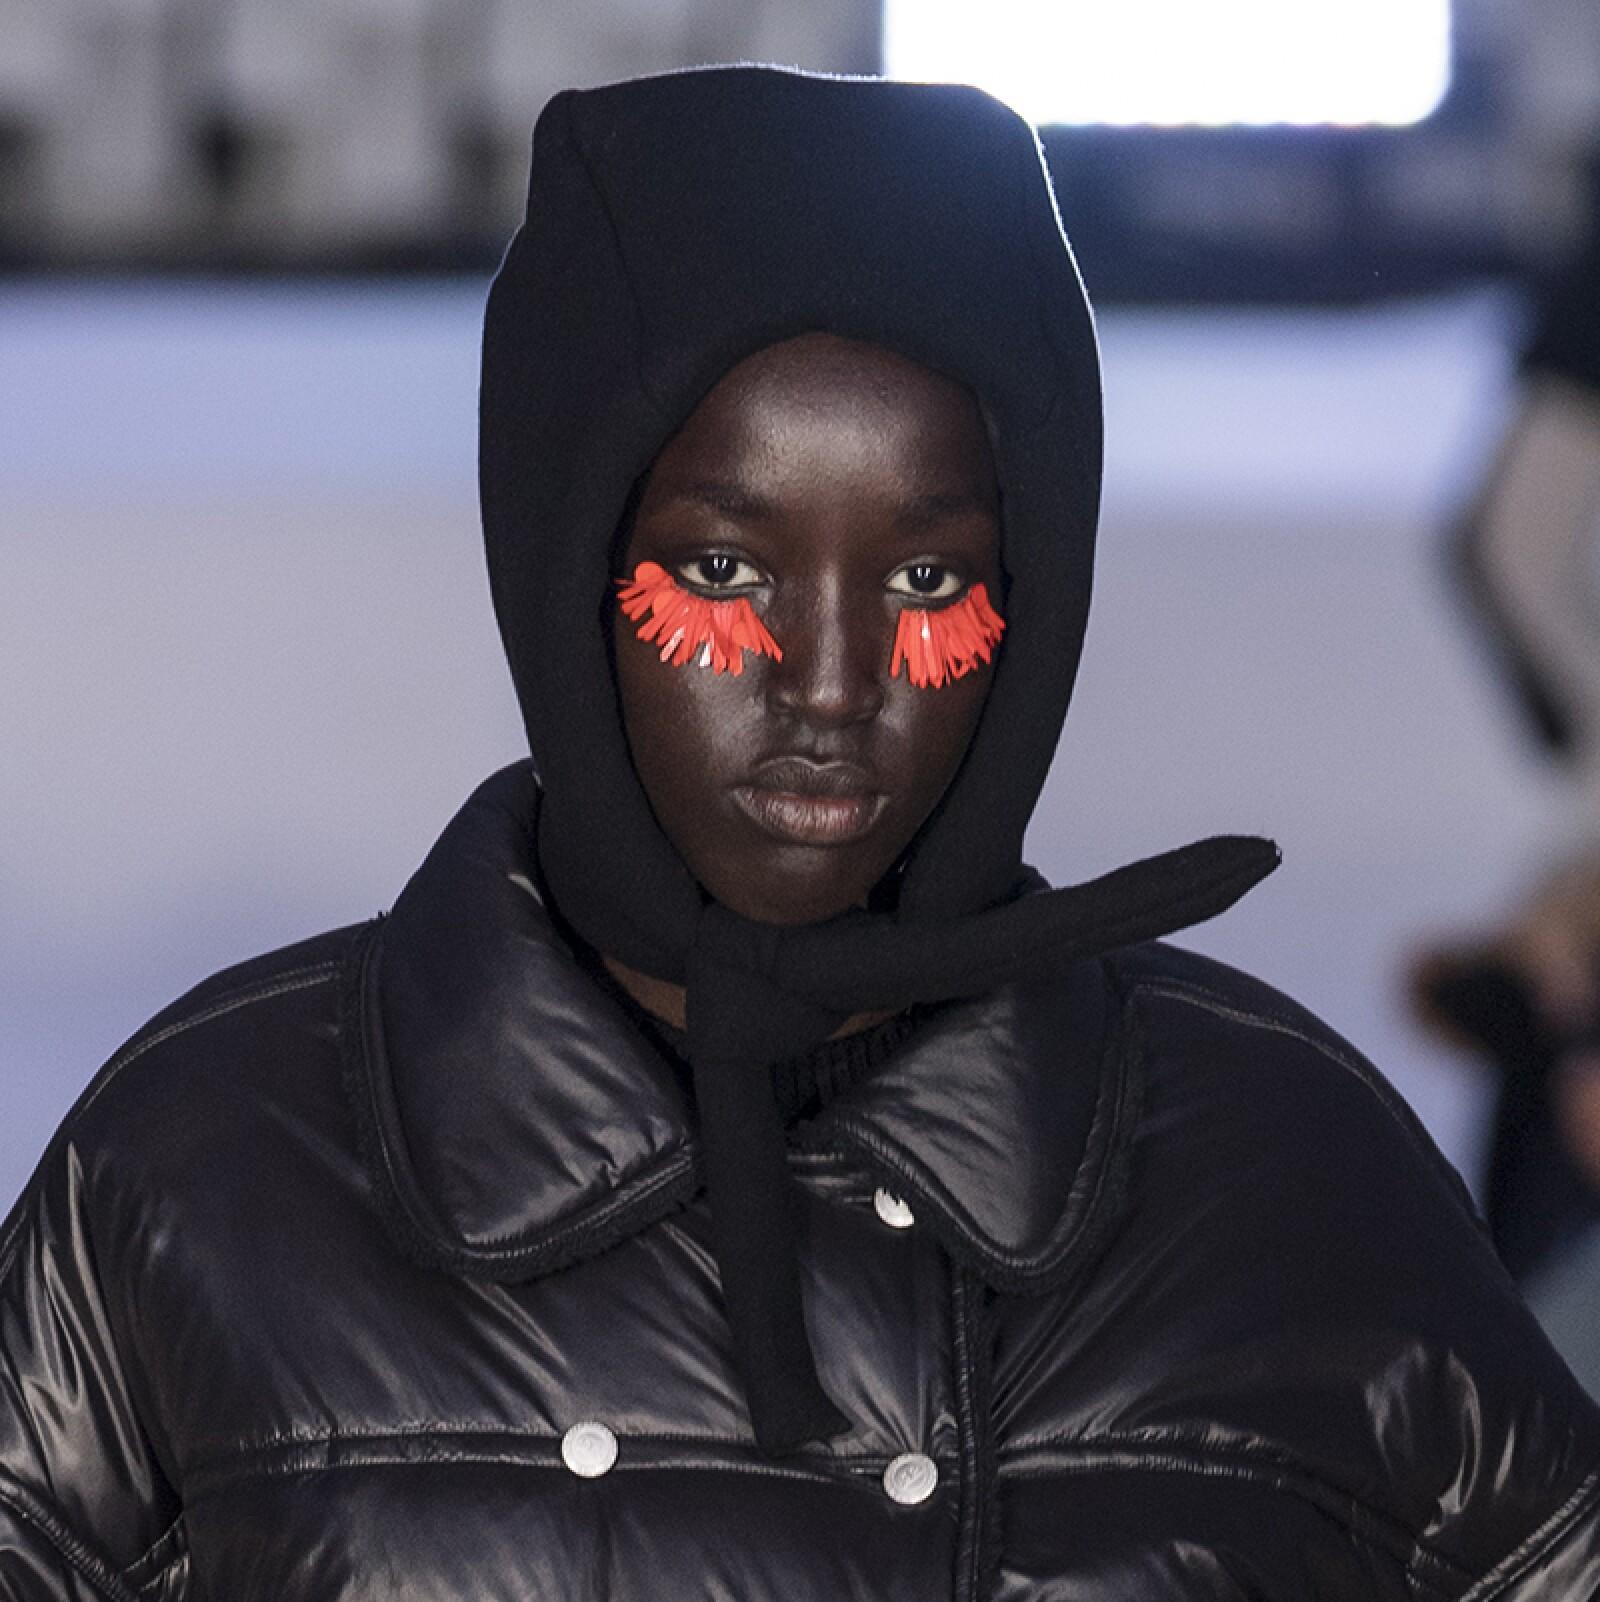 PFW-Paris-Fashion-Week-Runway-Pasarela-Beauty-Look-Belleza-Courreges